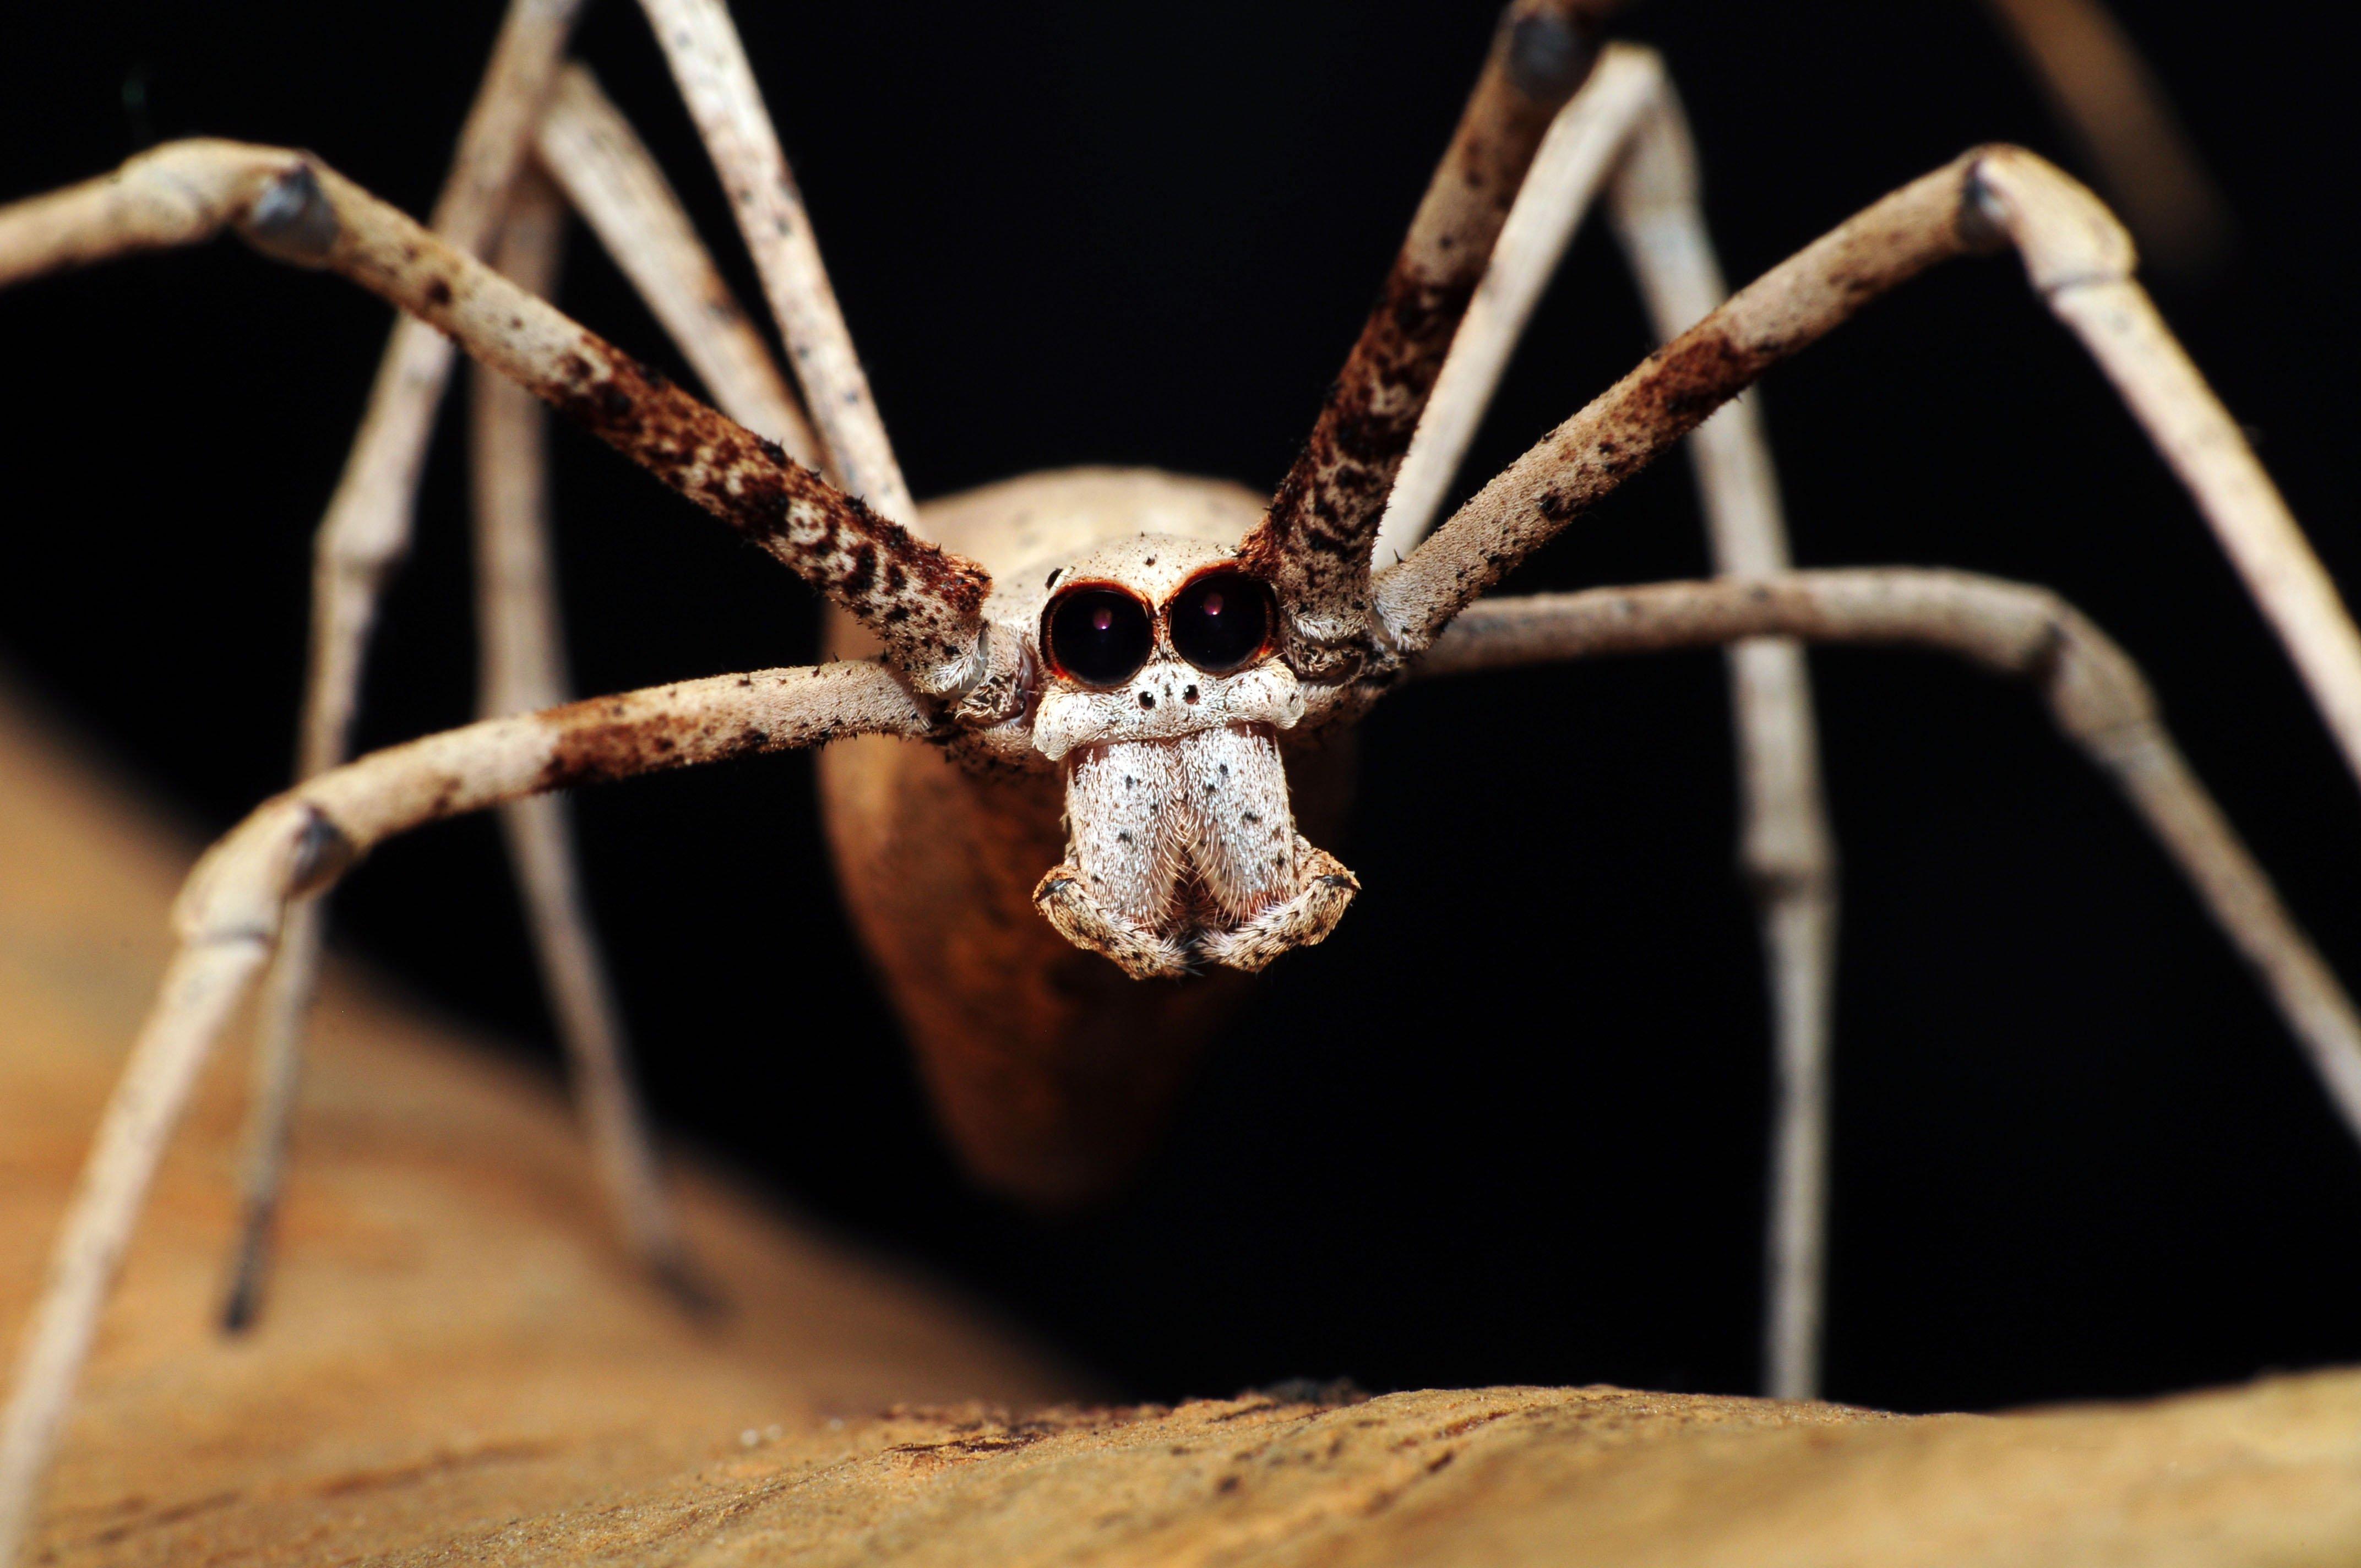 Cute Jumping Spider Wallpaper Spider 4k Ultra Hd Wallpaper Background Image